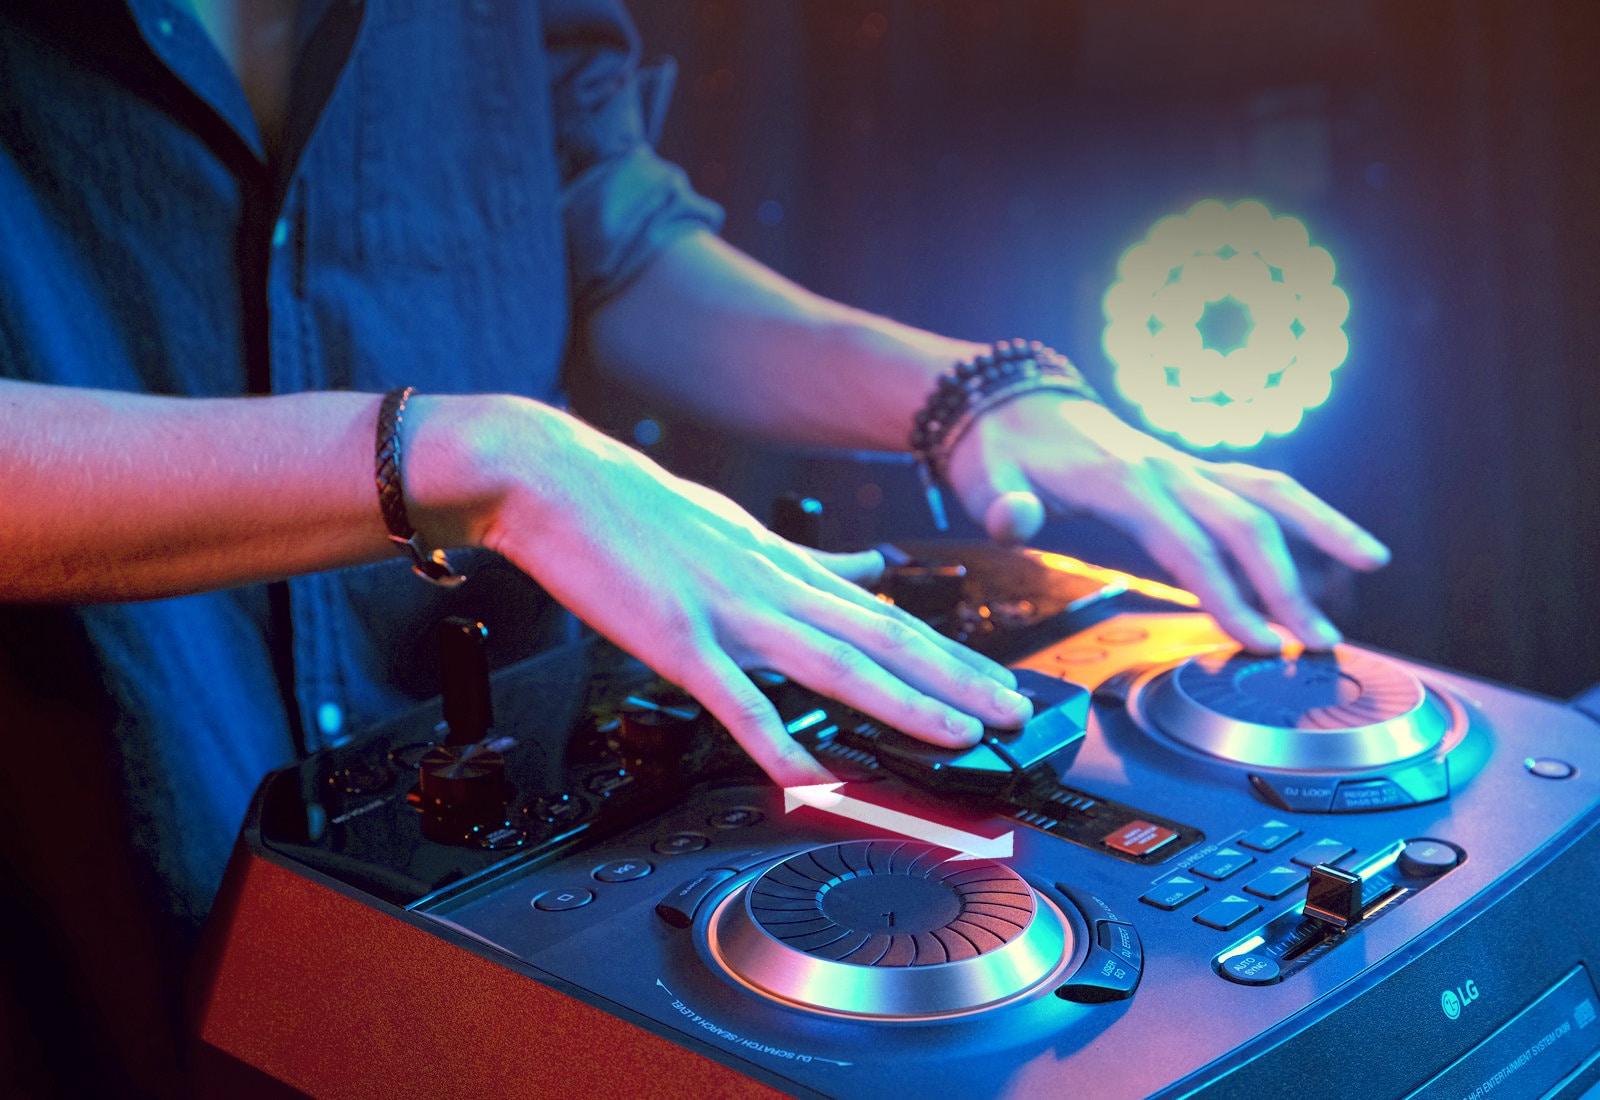 06_CK99_Accelerate_Your_Party_Desktop